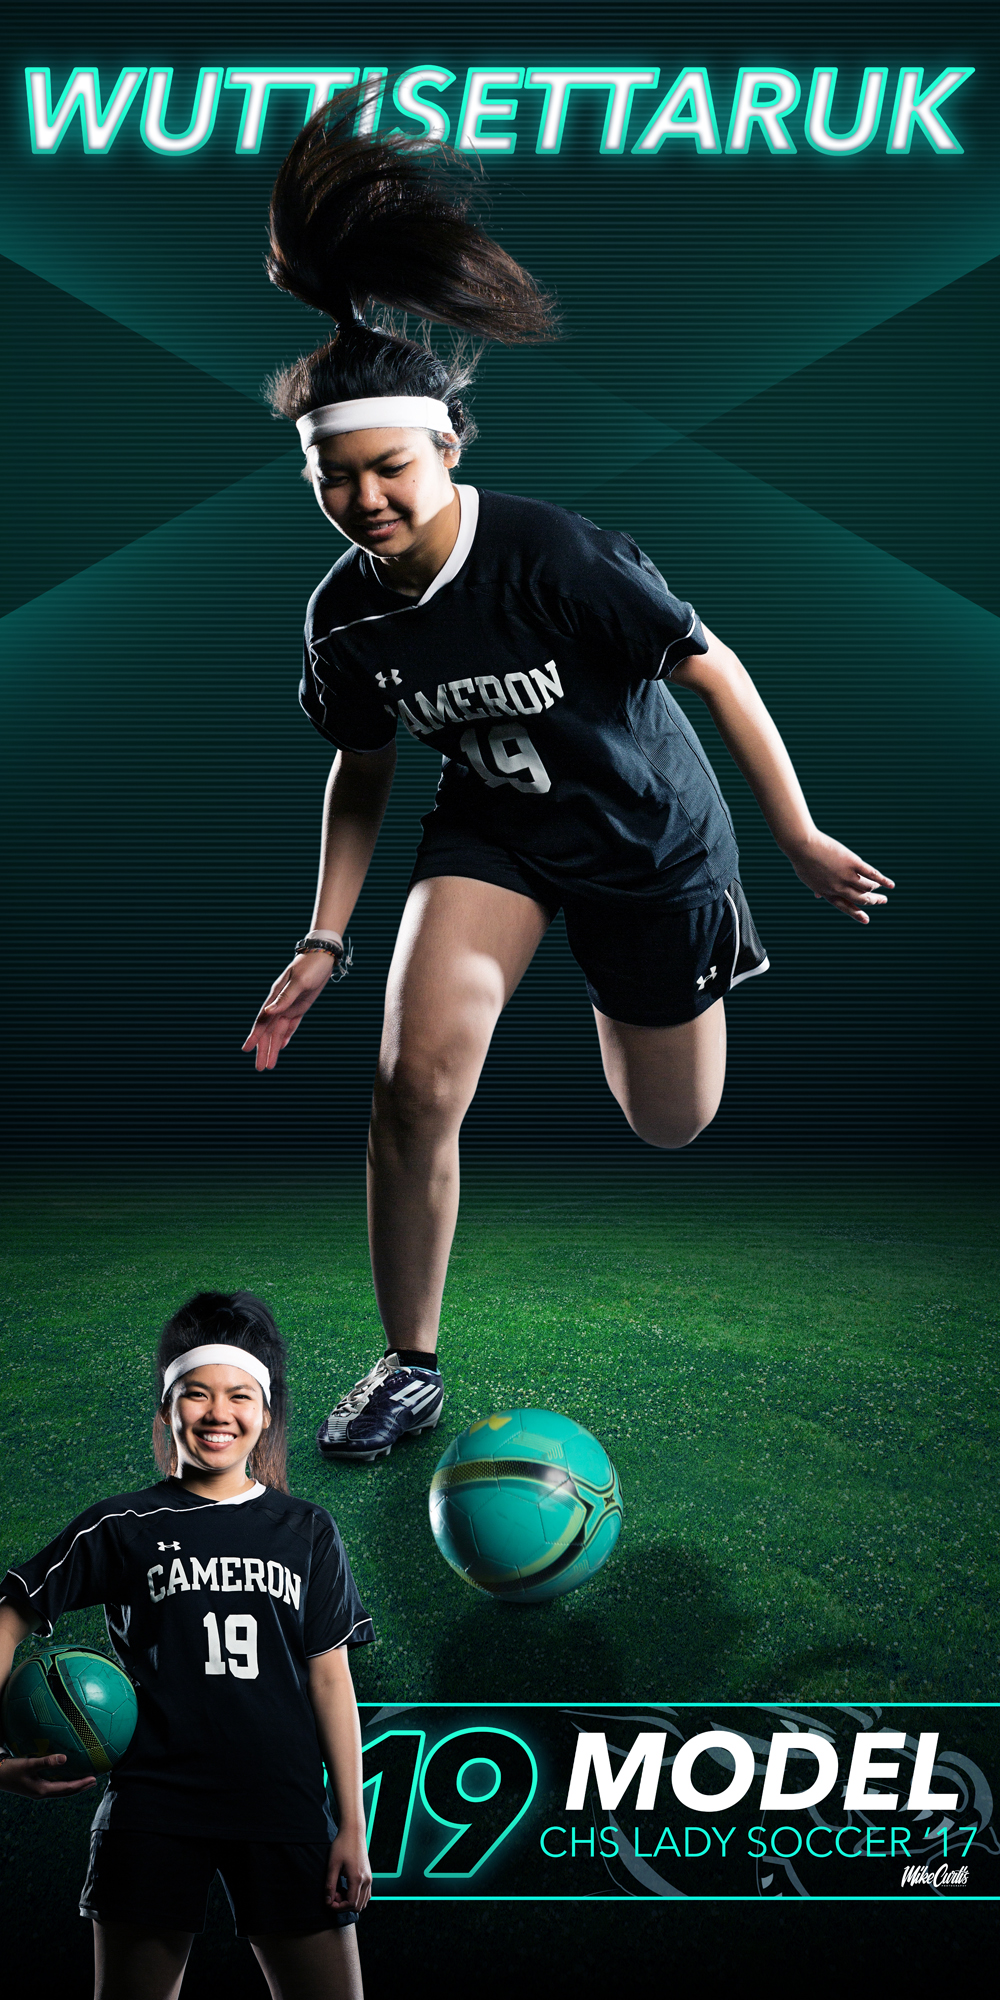 CHS-Lady-Soccer-17_Wuttisettaruk_2x4-Banner.jpg